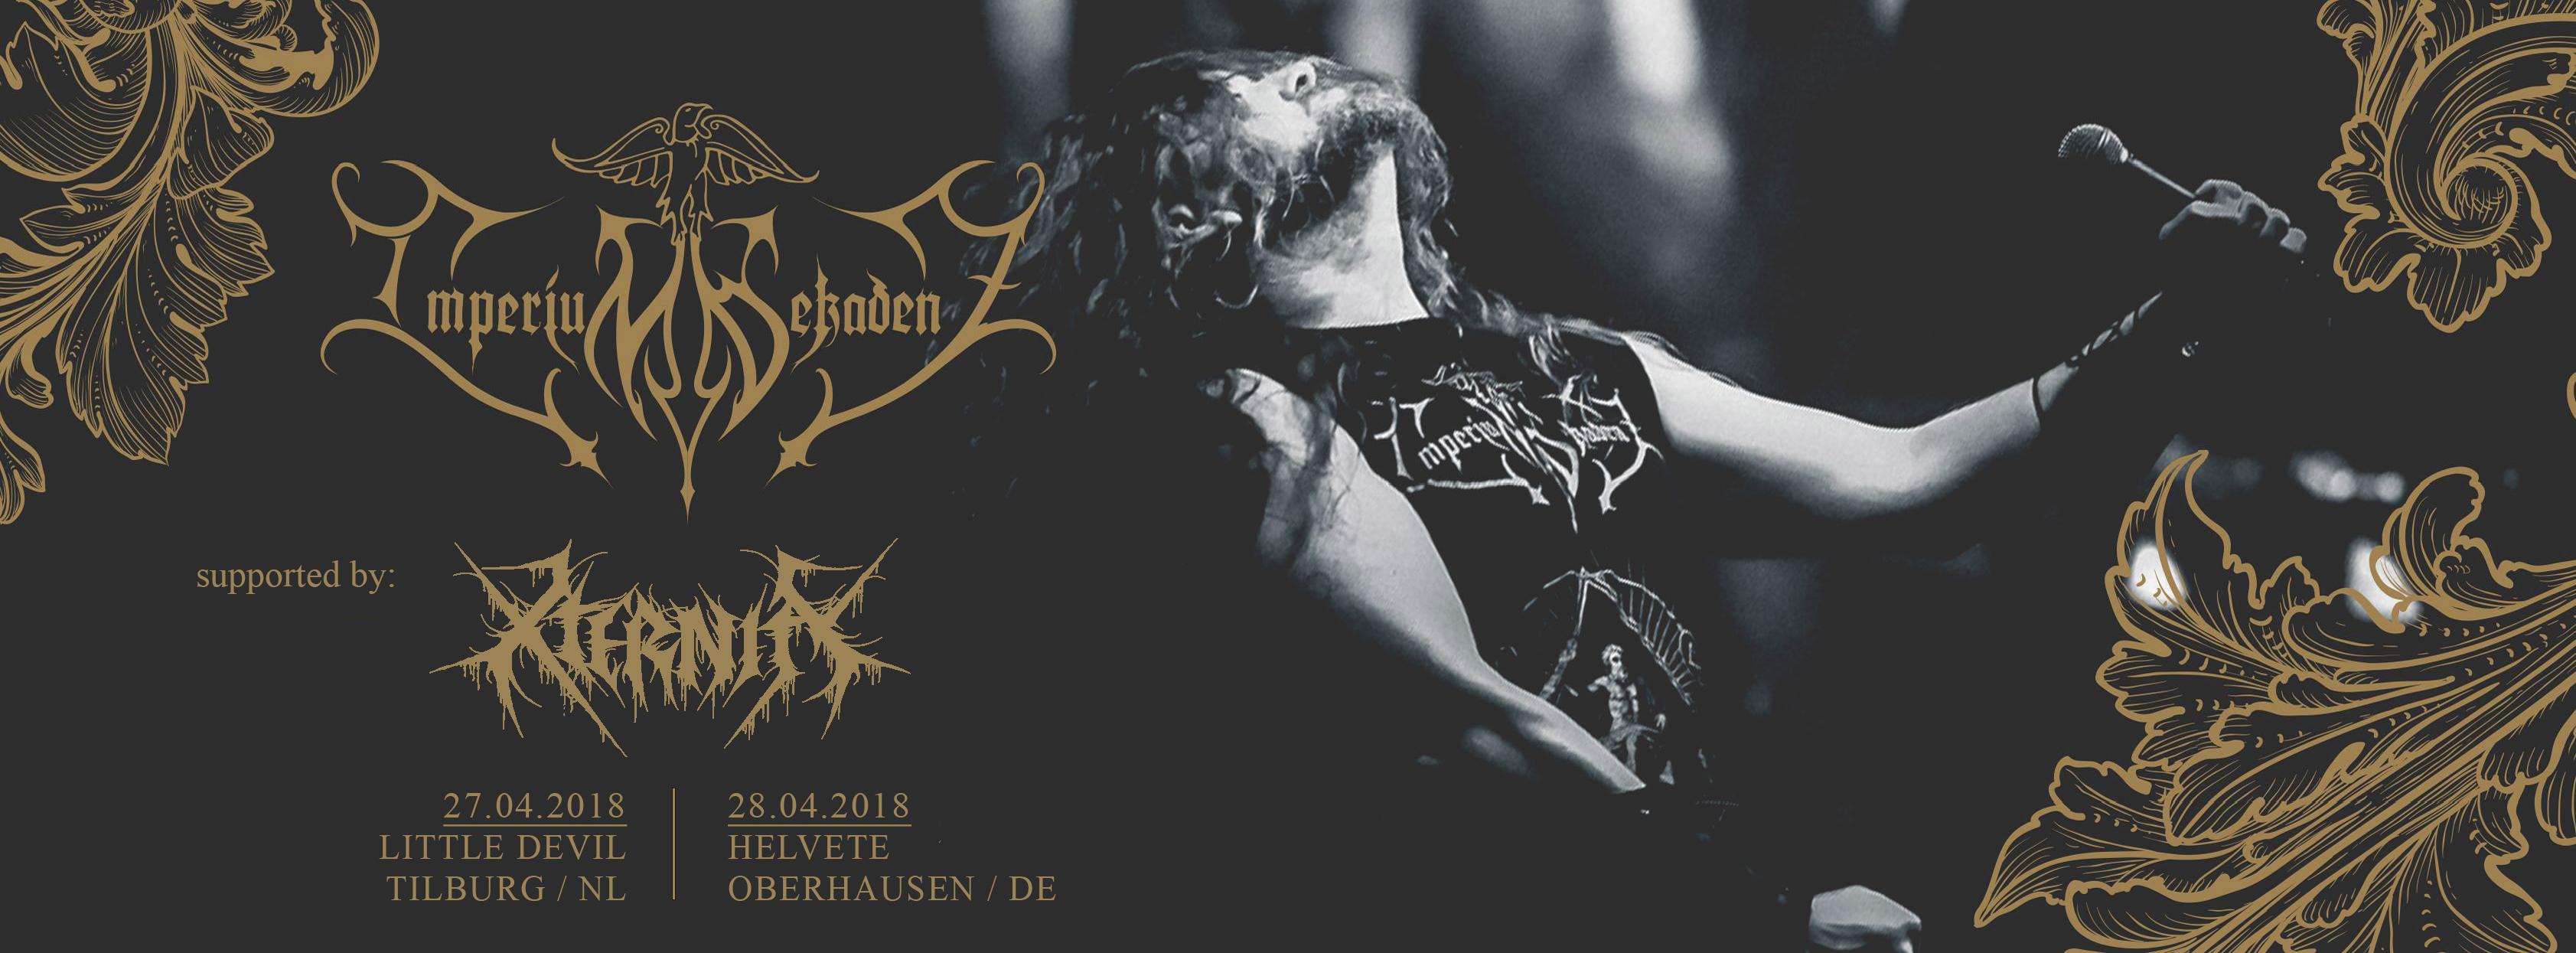 Konzertplakat Imperium Dekadenz 2018